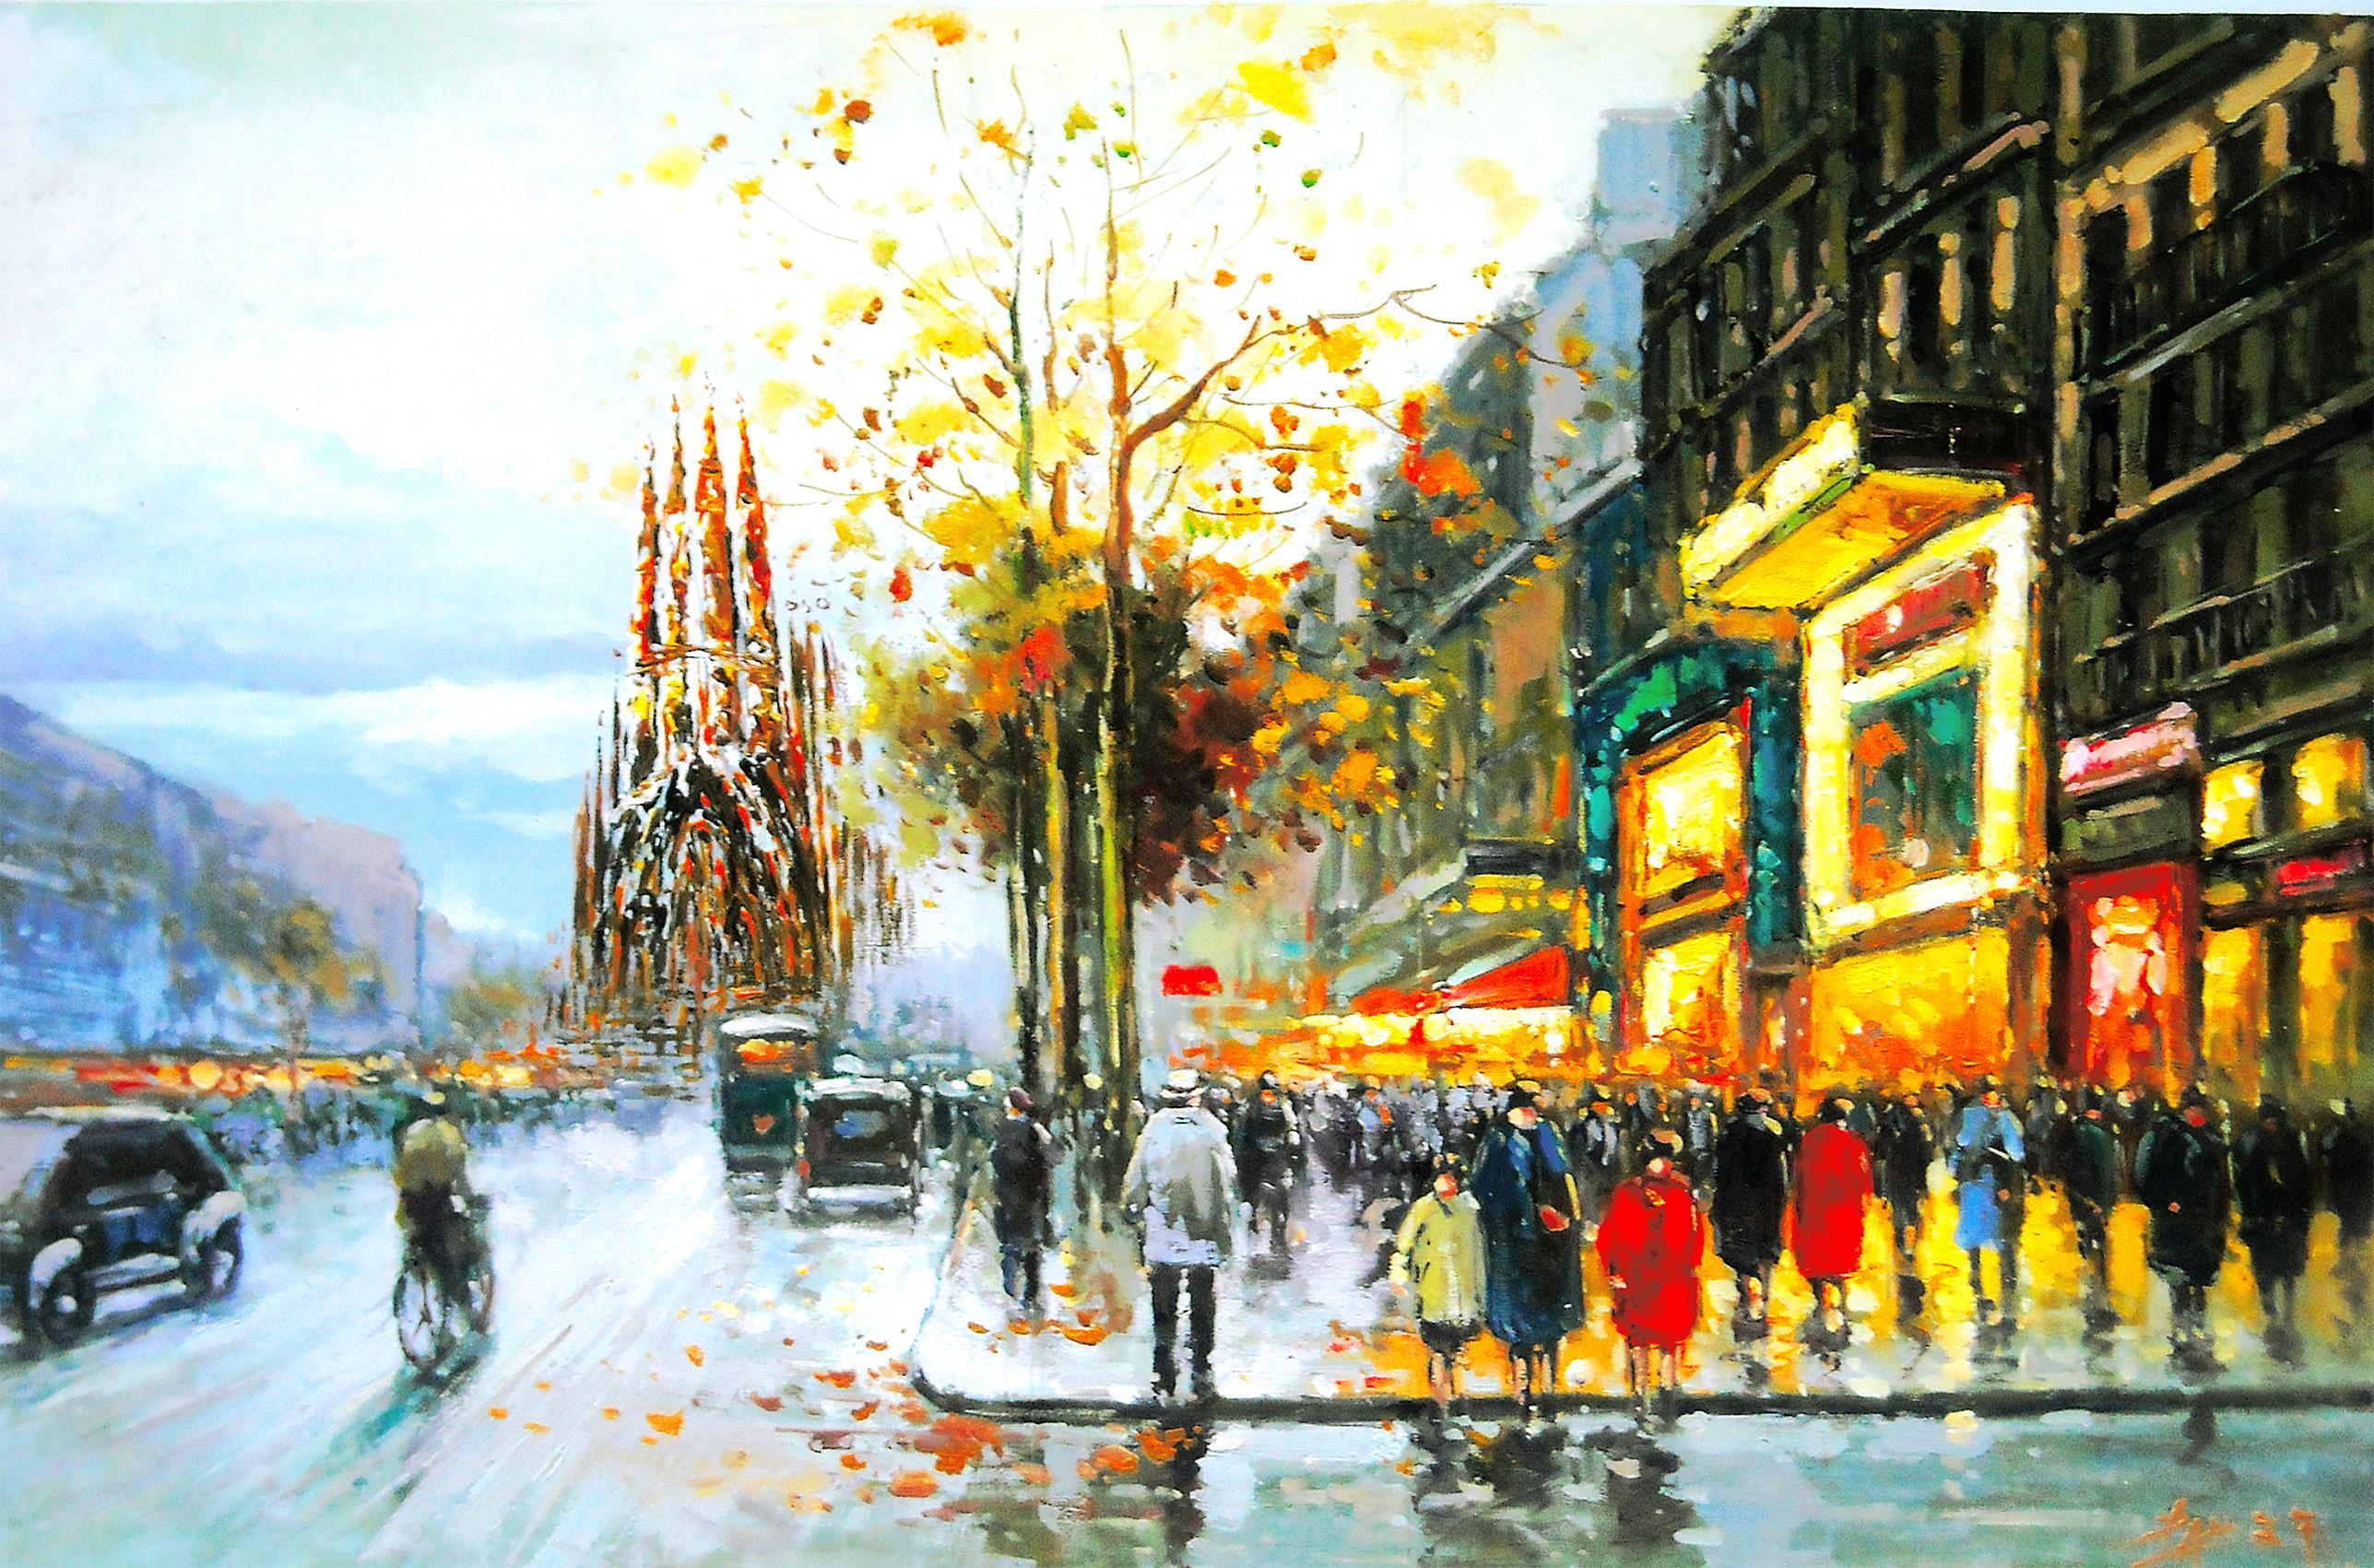 Barcelona aeYaeYGaudi cathedral views people trees city street rain autumn painting wallpaper ...